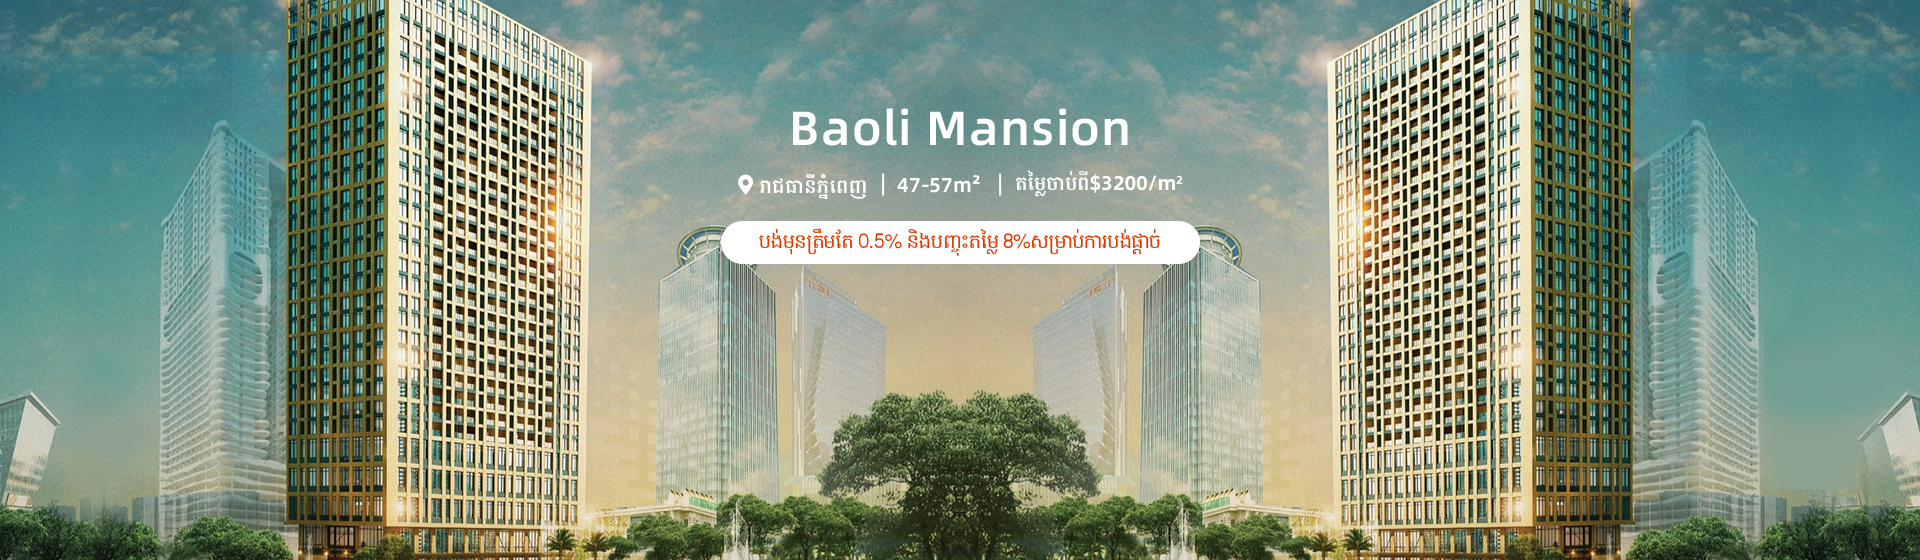 Header banner Baoli Mansion (KH)